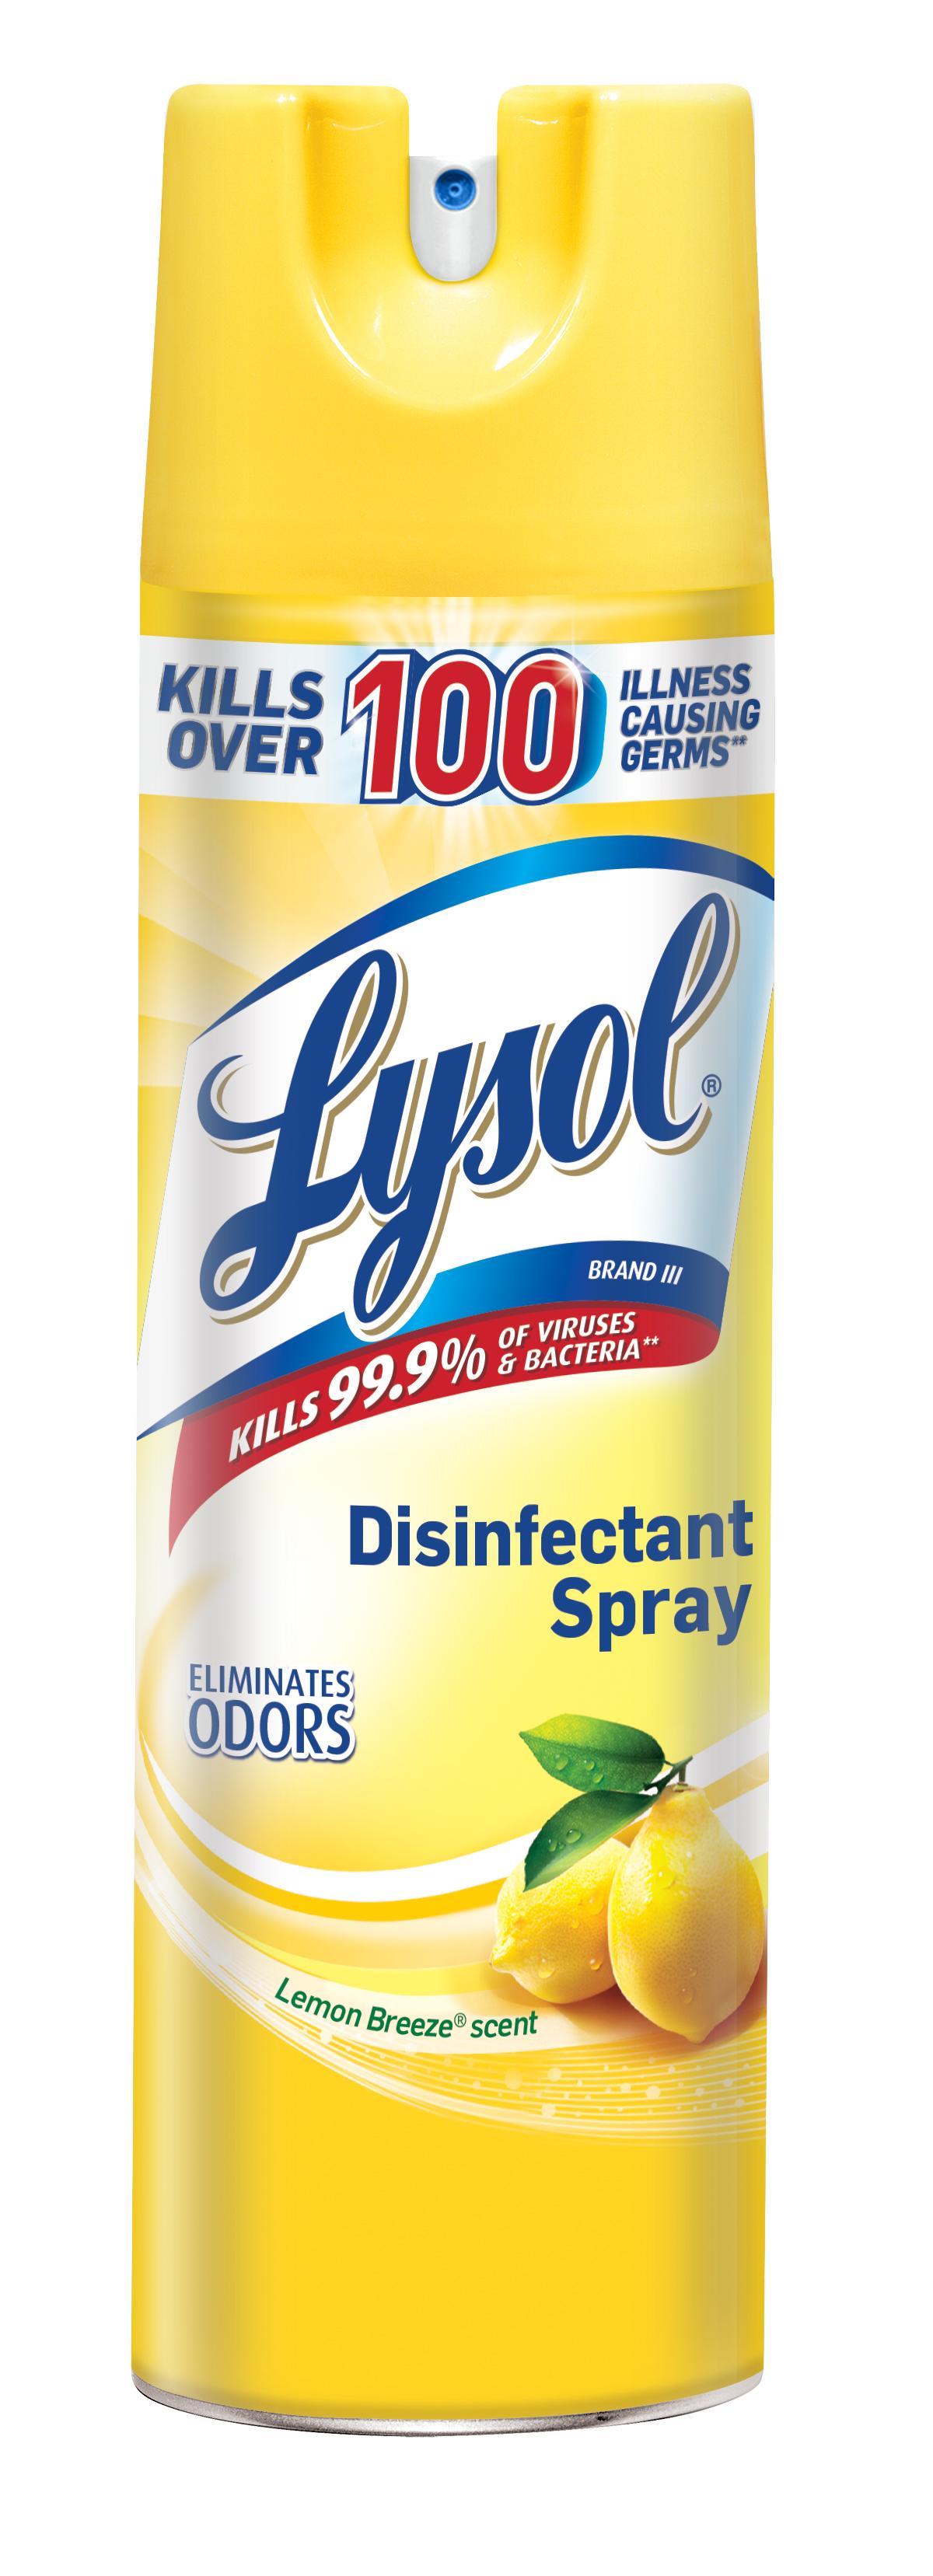 Lysol Disinfectant Spray, Lemon Breeze, 19oz